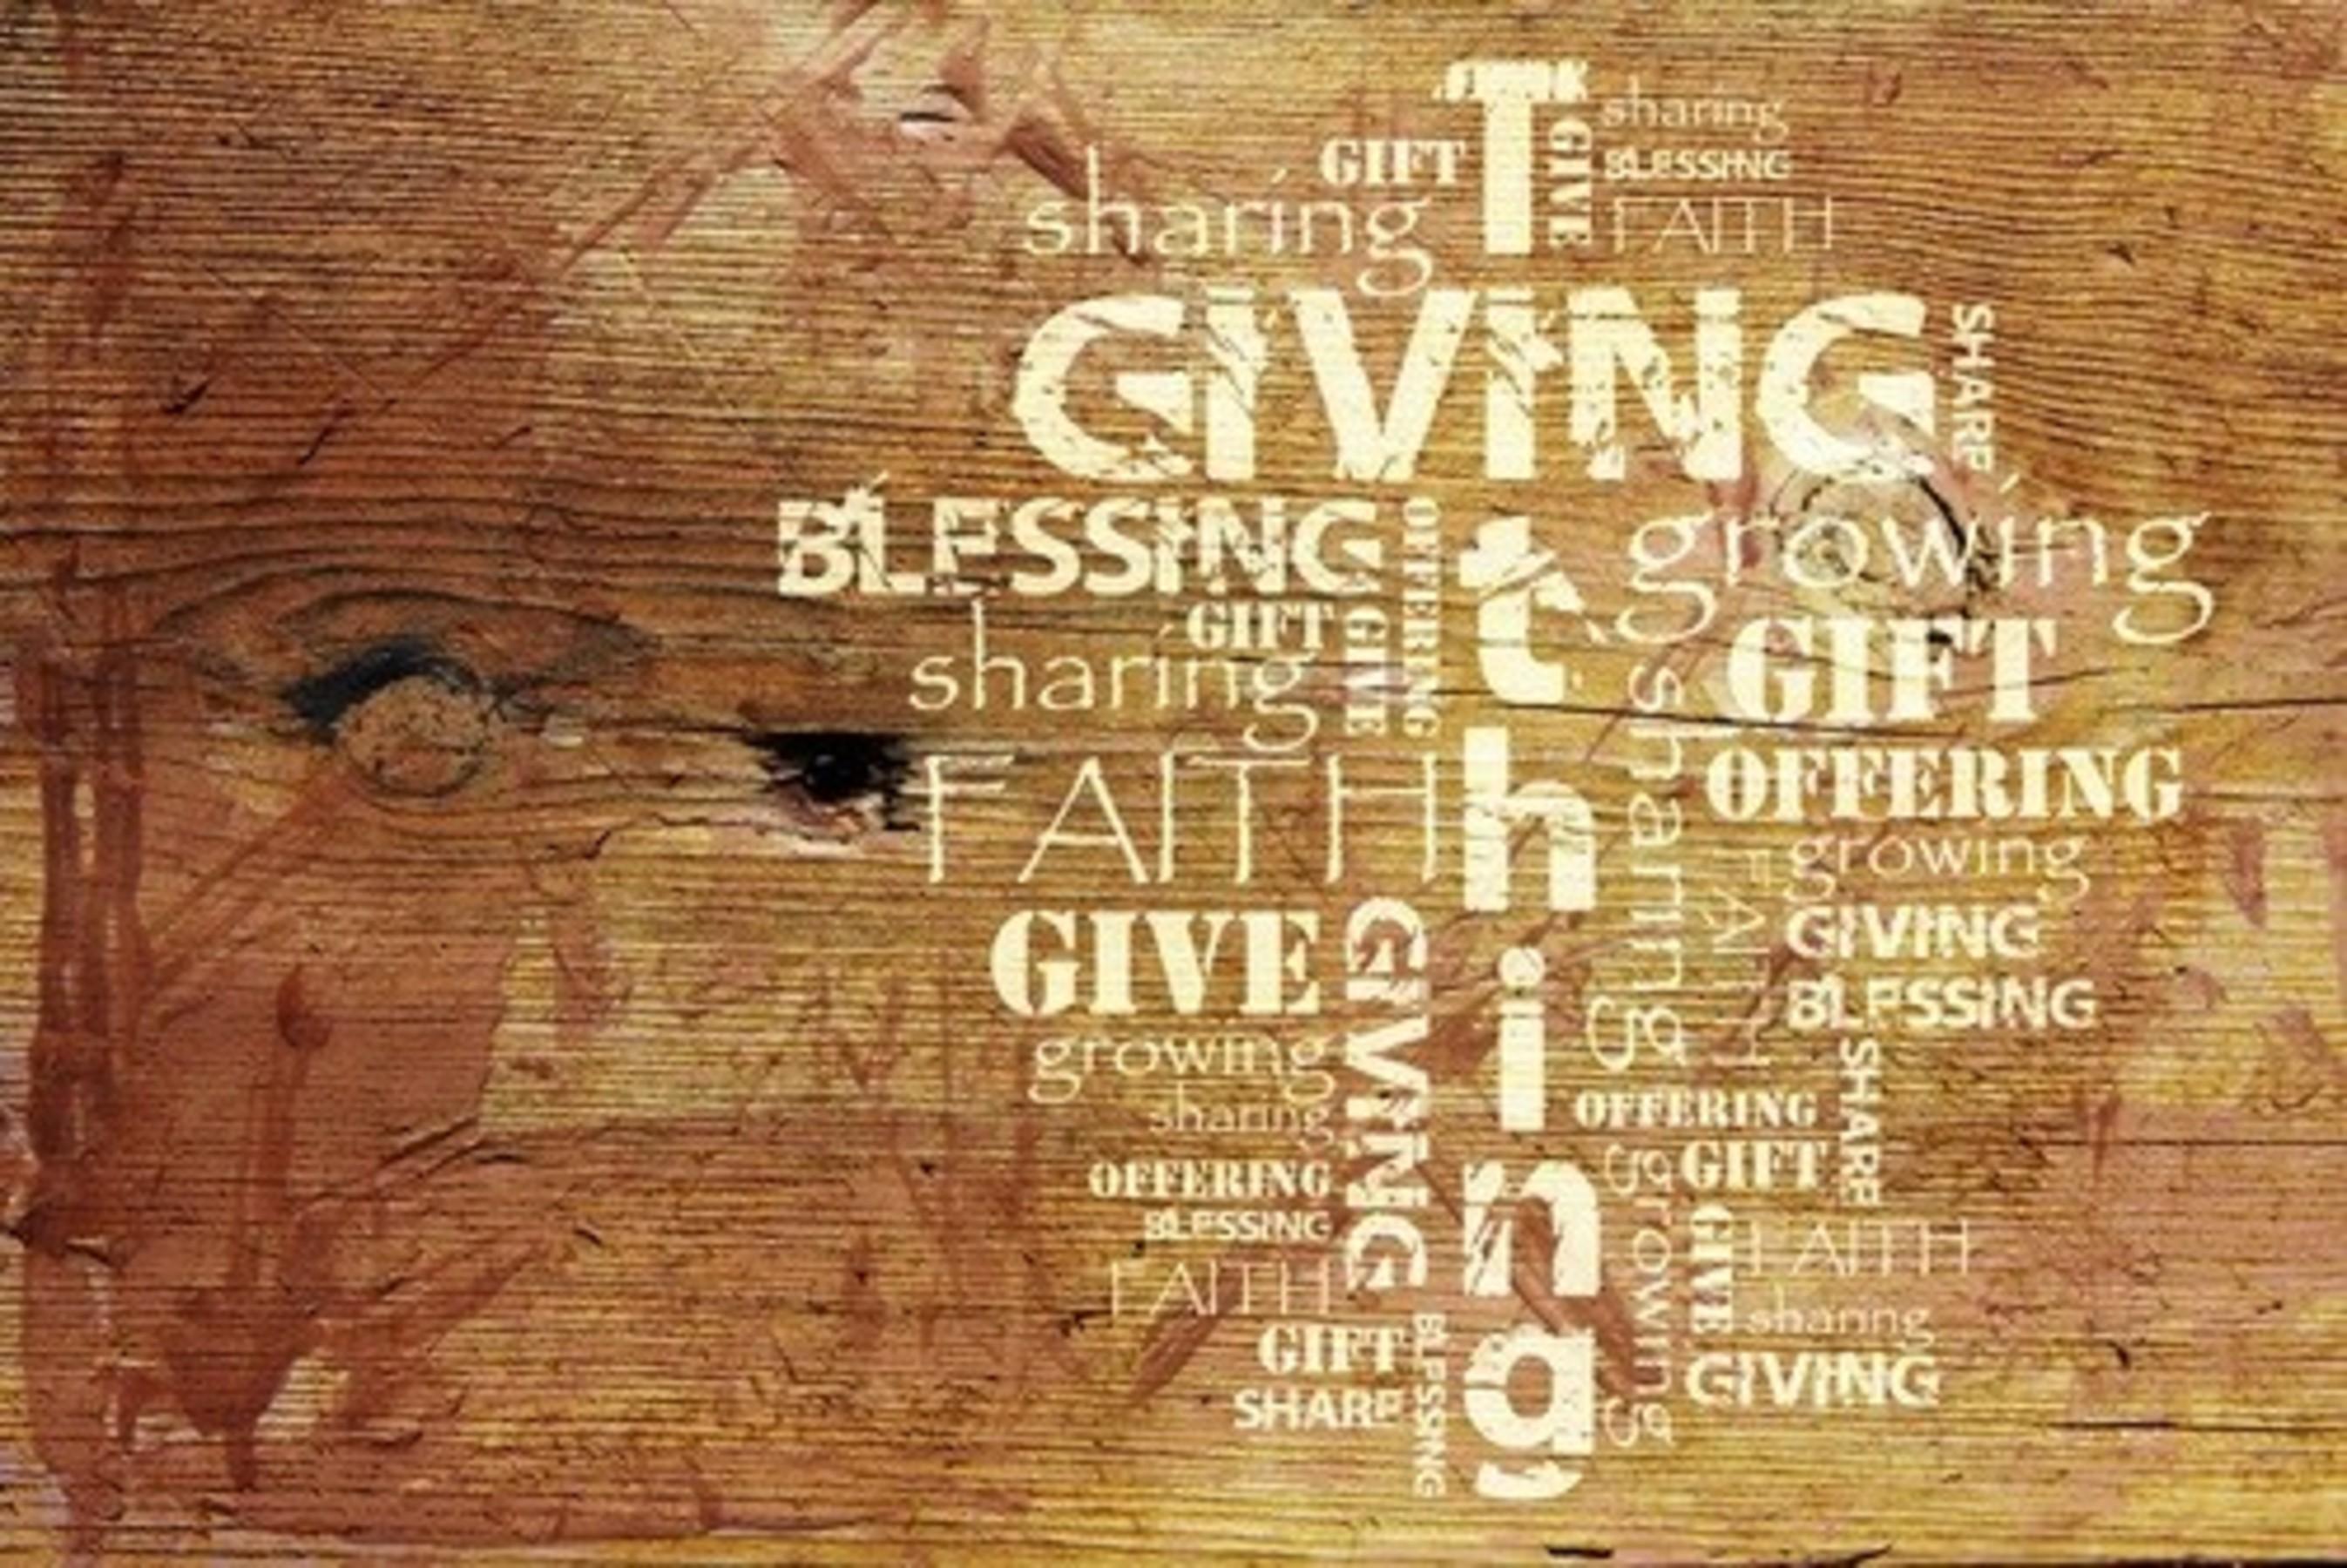 Tithing Wordplay